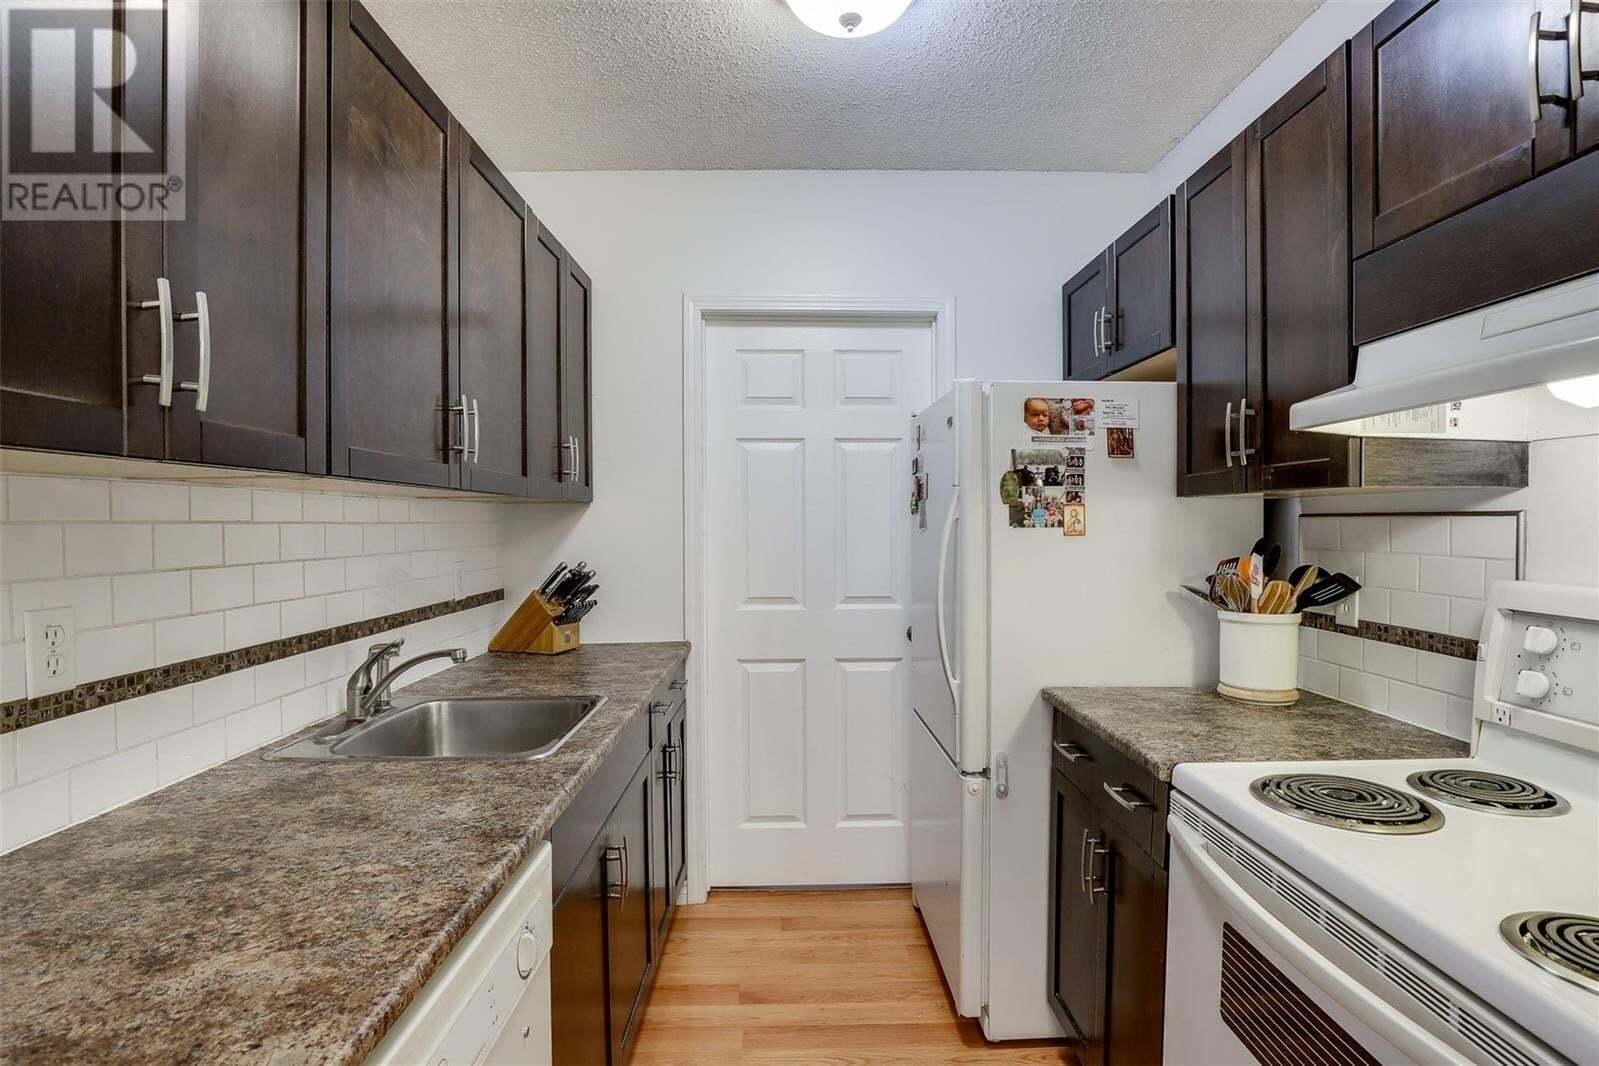 Condo for sale at 306 802c Kingsmere Blvd Saskatoon Saskatchewan - MLS: SK821213